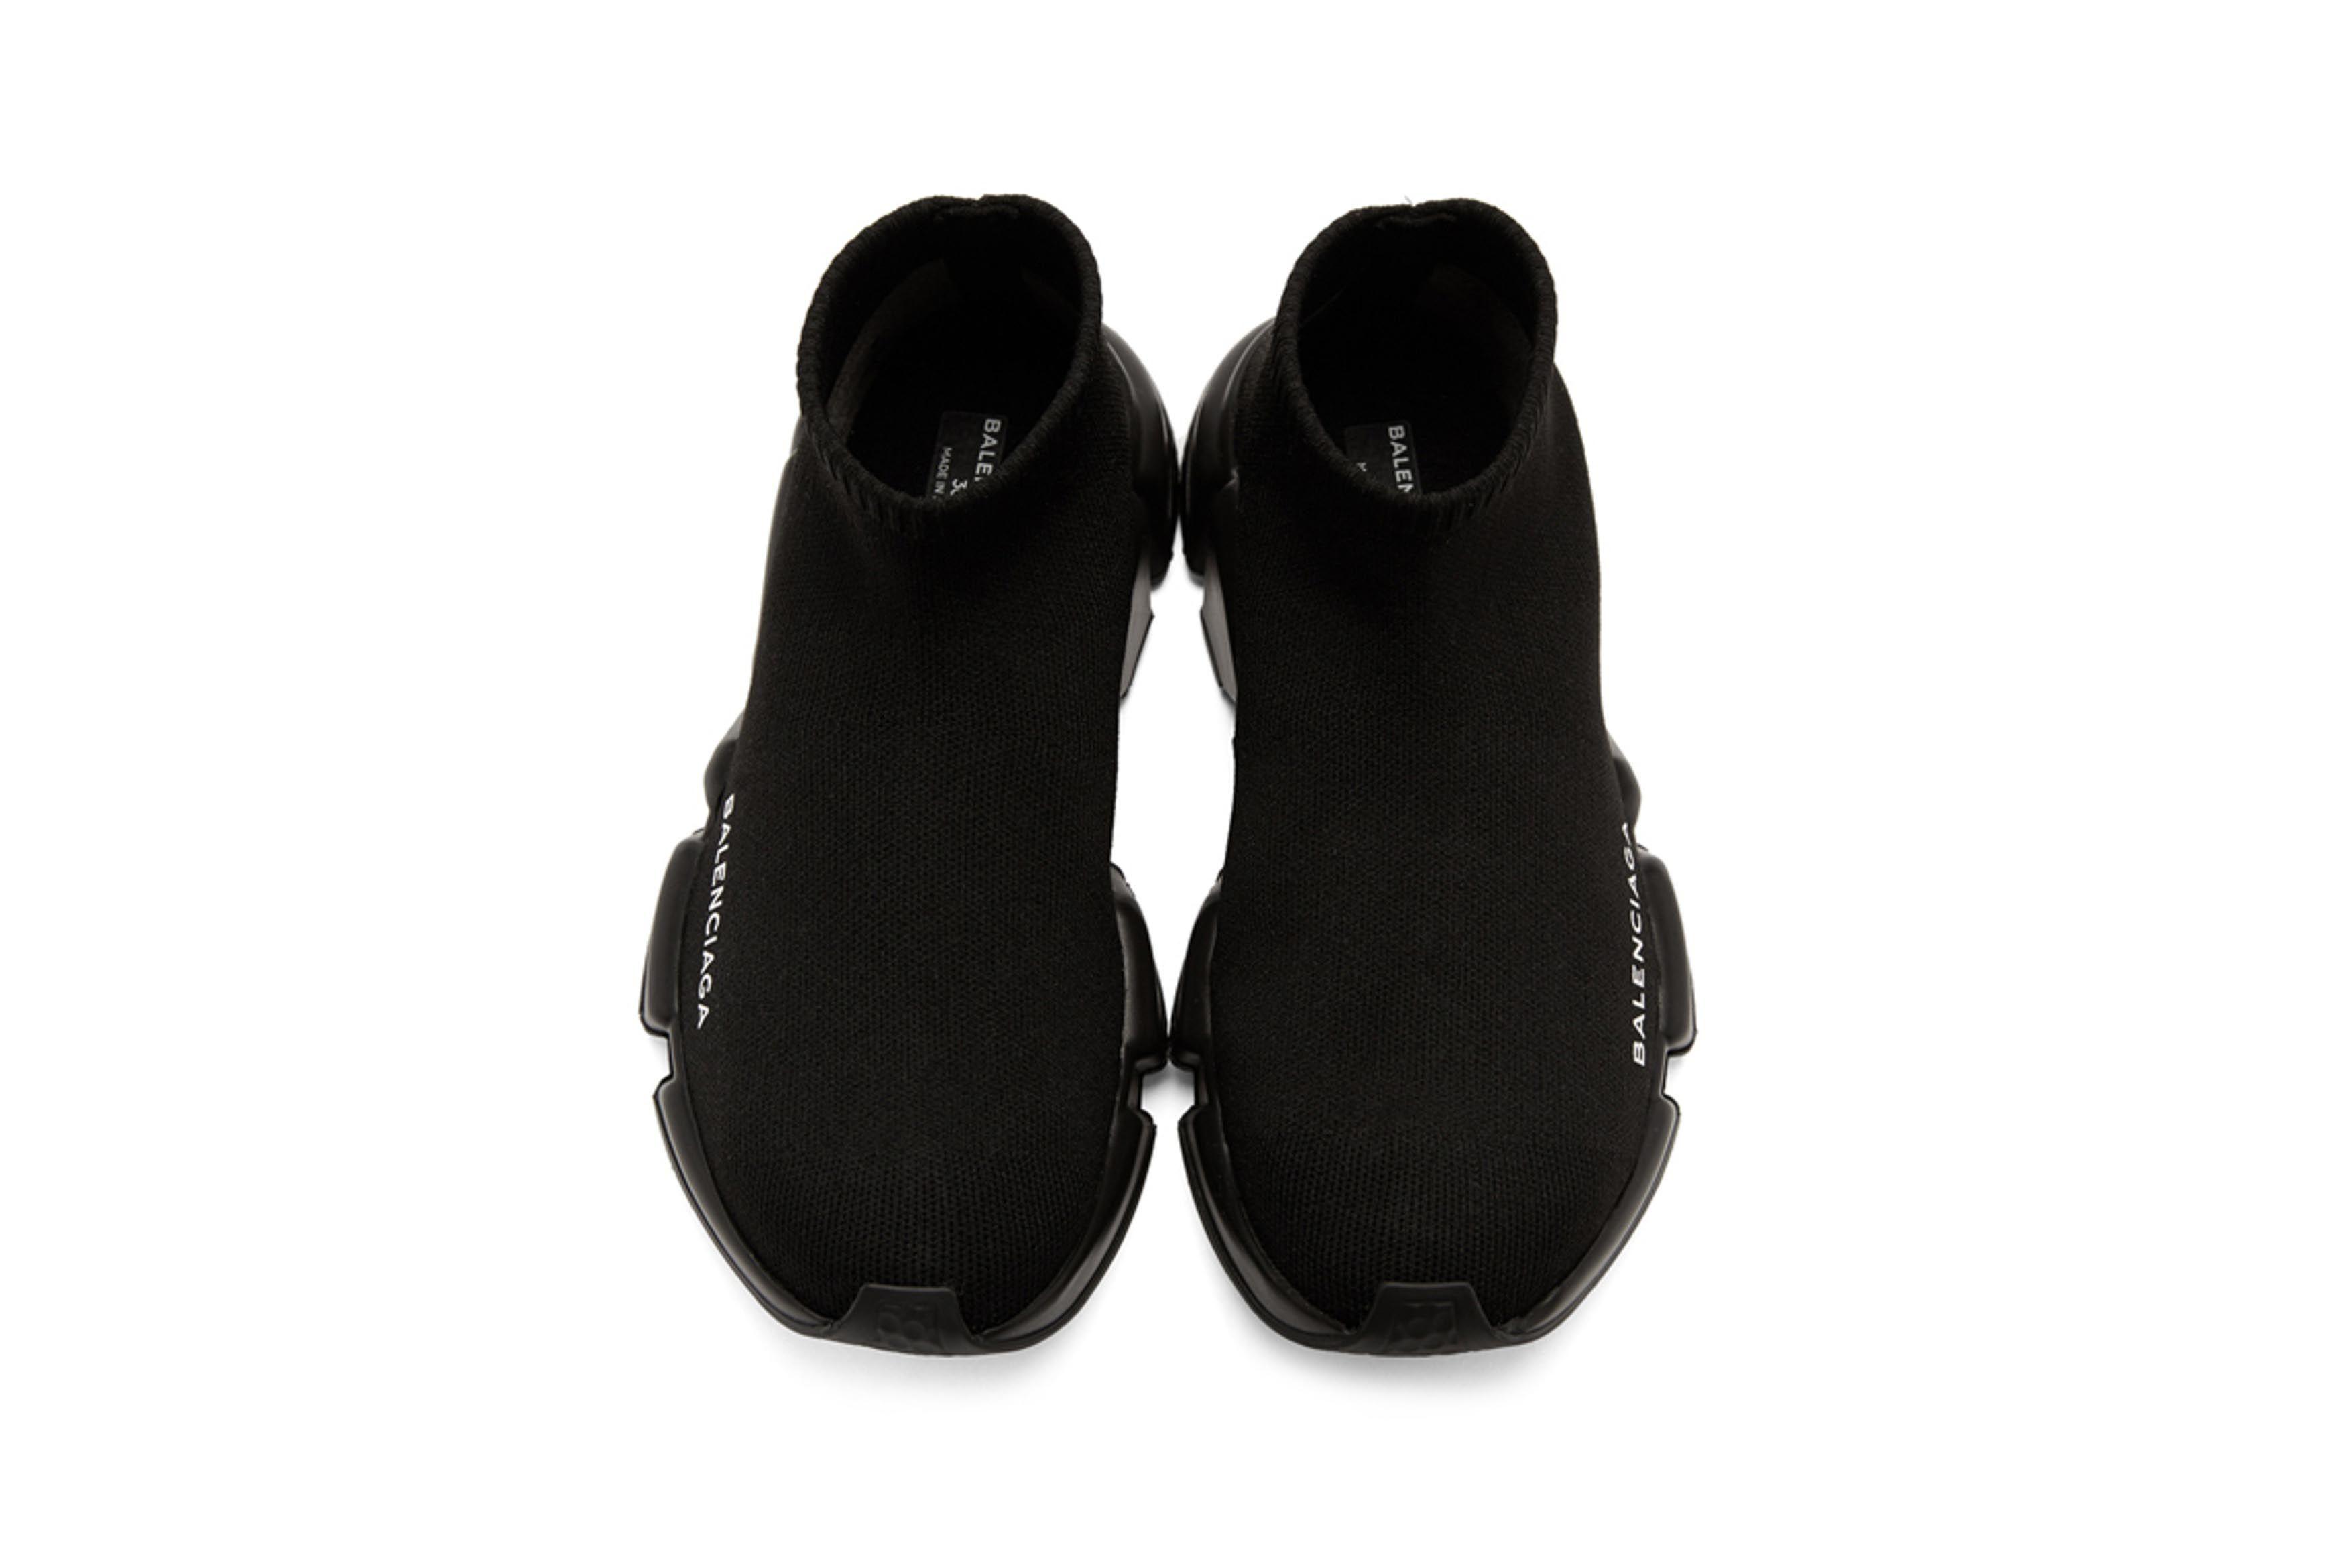 Balenciaga Speed Low High Top Sneakers Black Navy 2 Sneaker Freaker